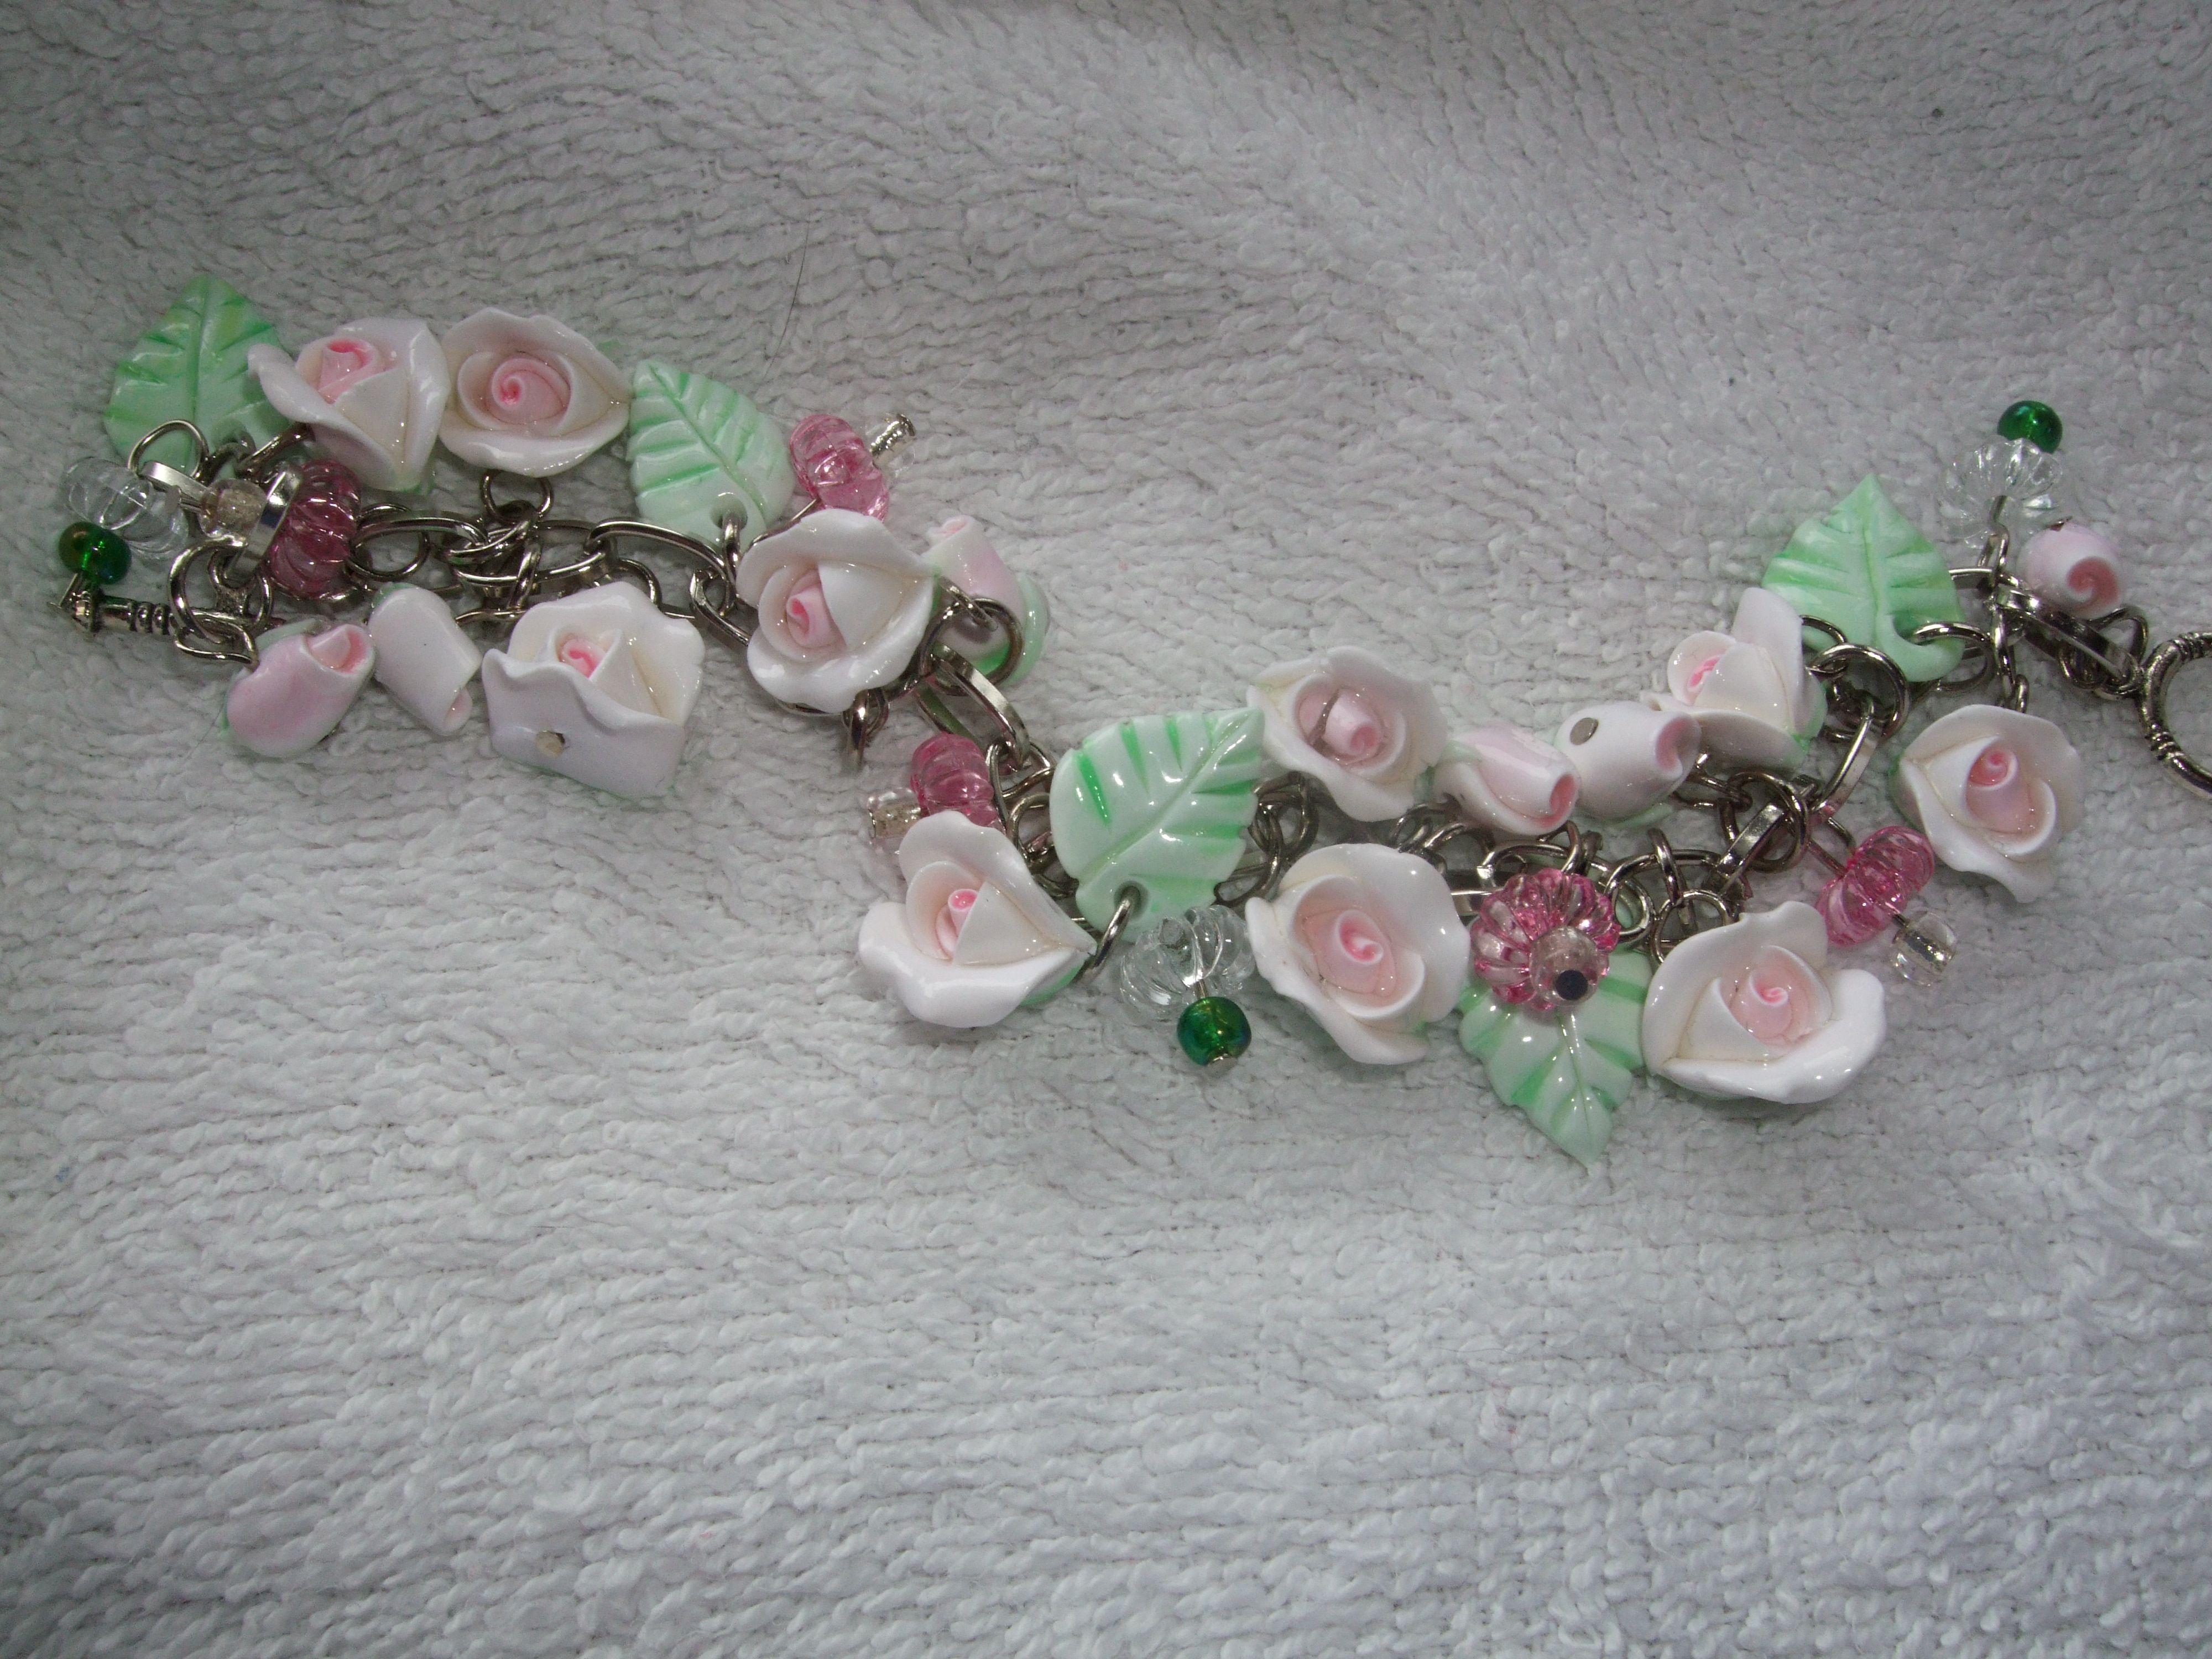 Pink rosebud, bead and green leaf charm bracelet.   #handmade #CreatingCottage #Roses #CottageStyle #Cottage #ShabbyChic #Shabby #Chic #polymerclay #white #pink #romantic  @Renee Holtzer